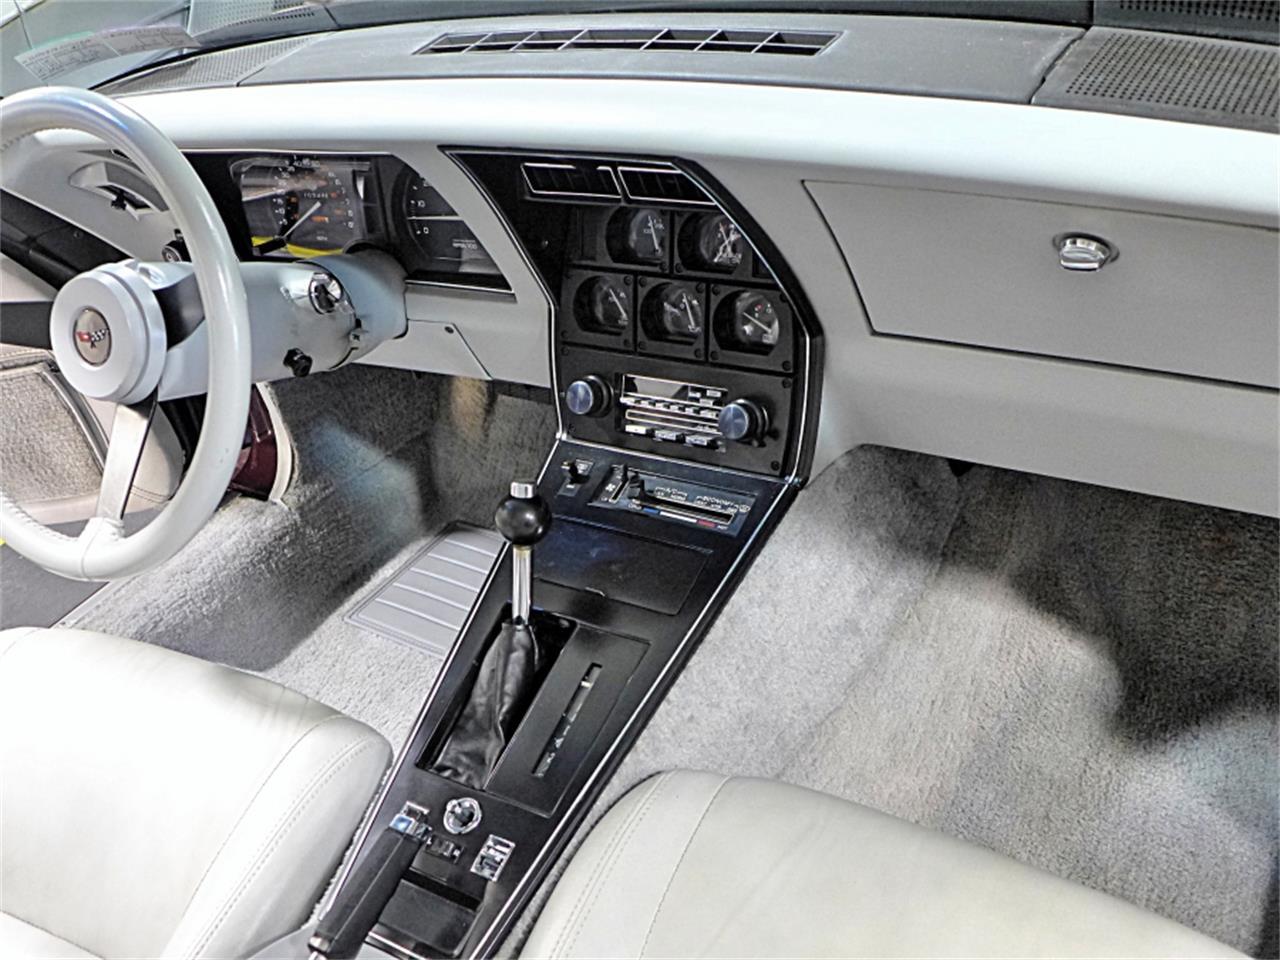 1982 Chevrolet Corvette (CC-1412678) for sale in Old Forge, Pennsylvania